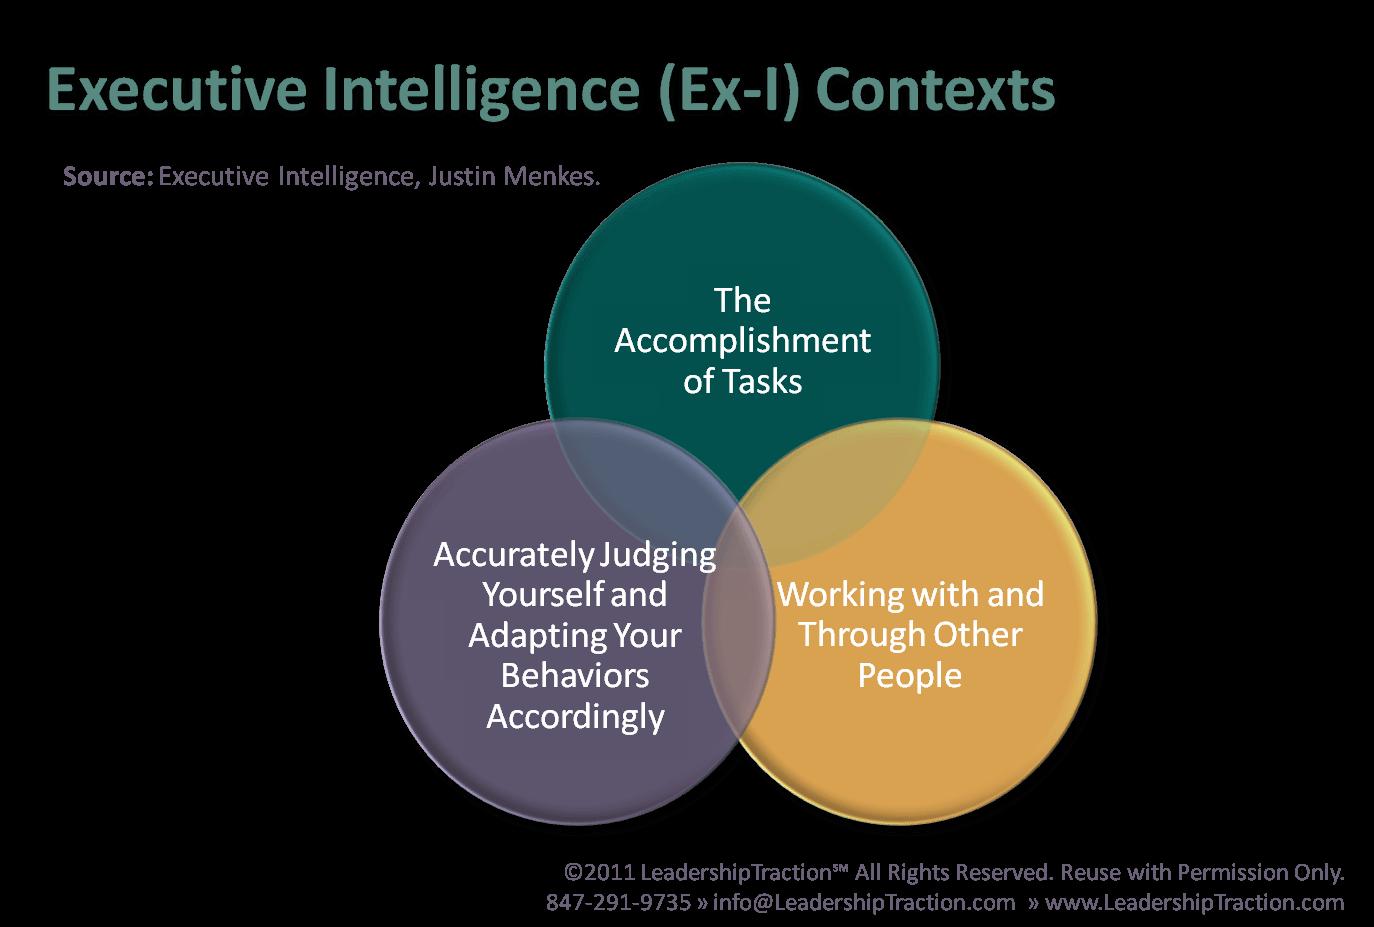 Leadershiptraction